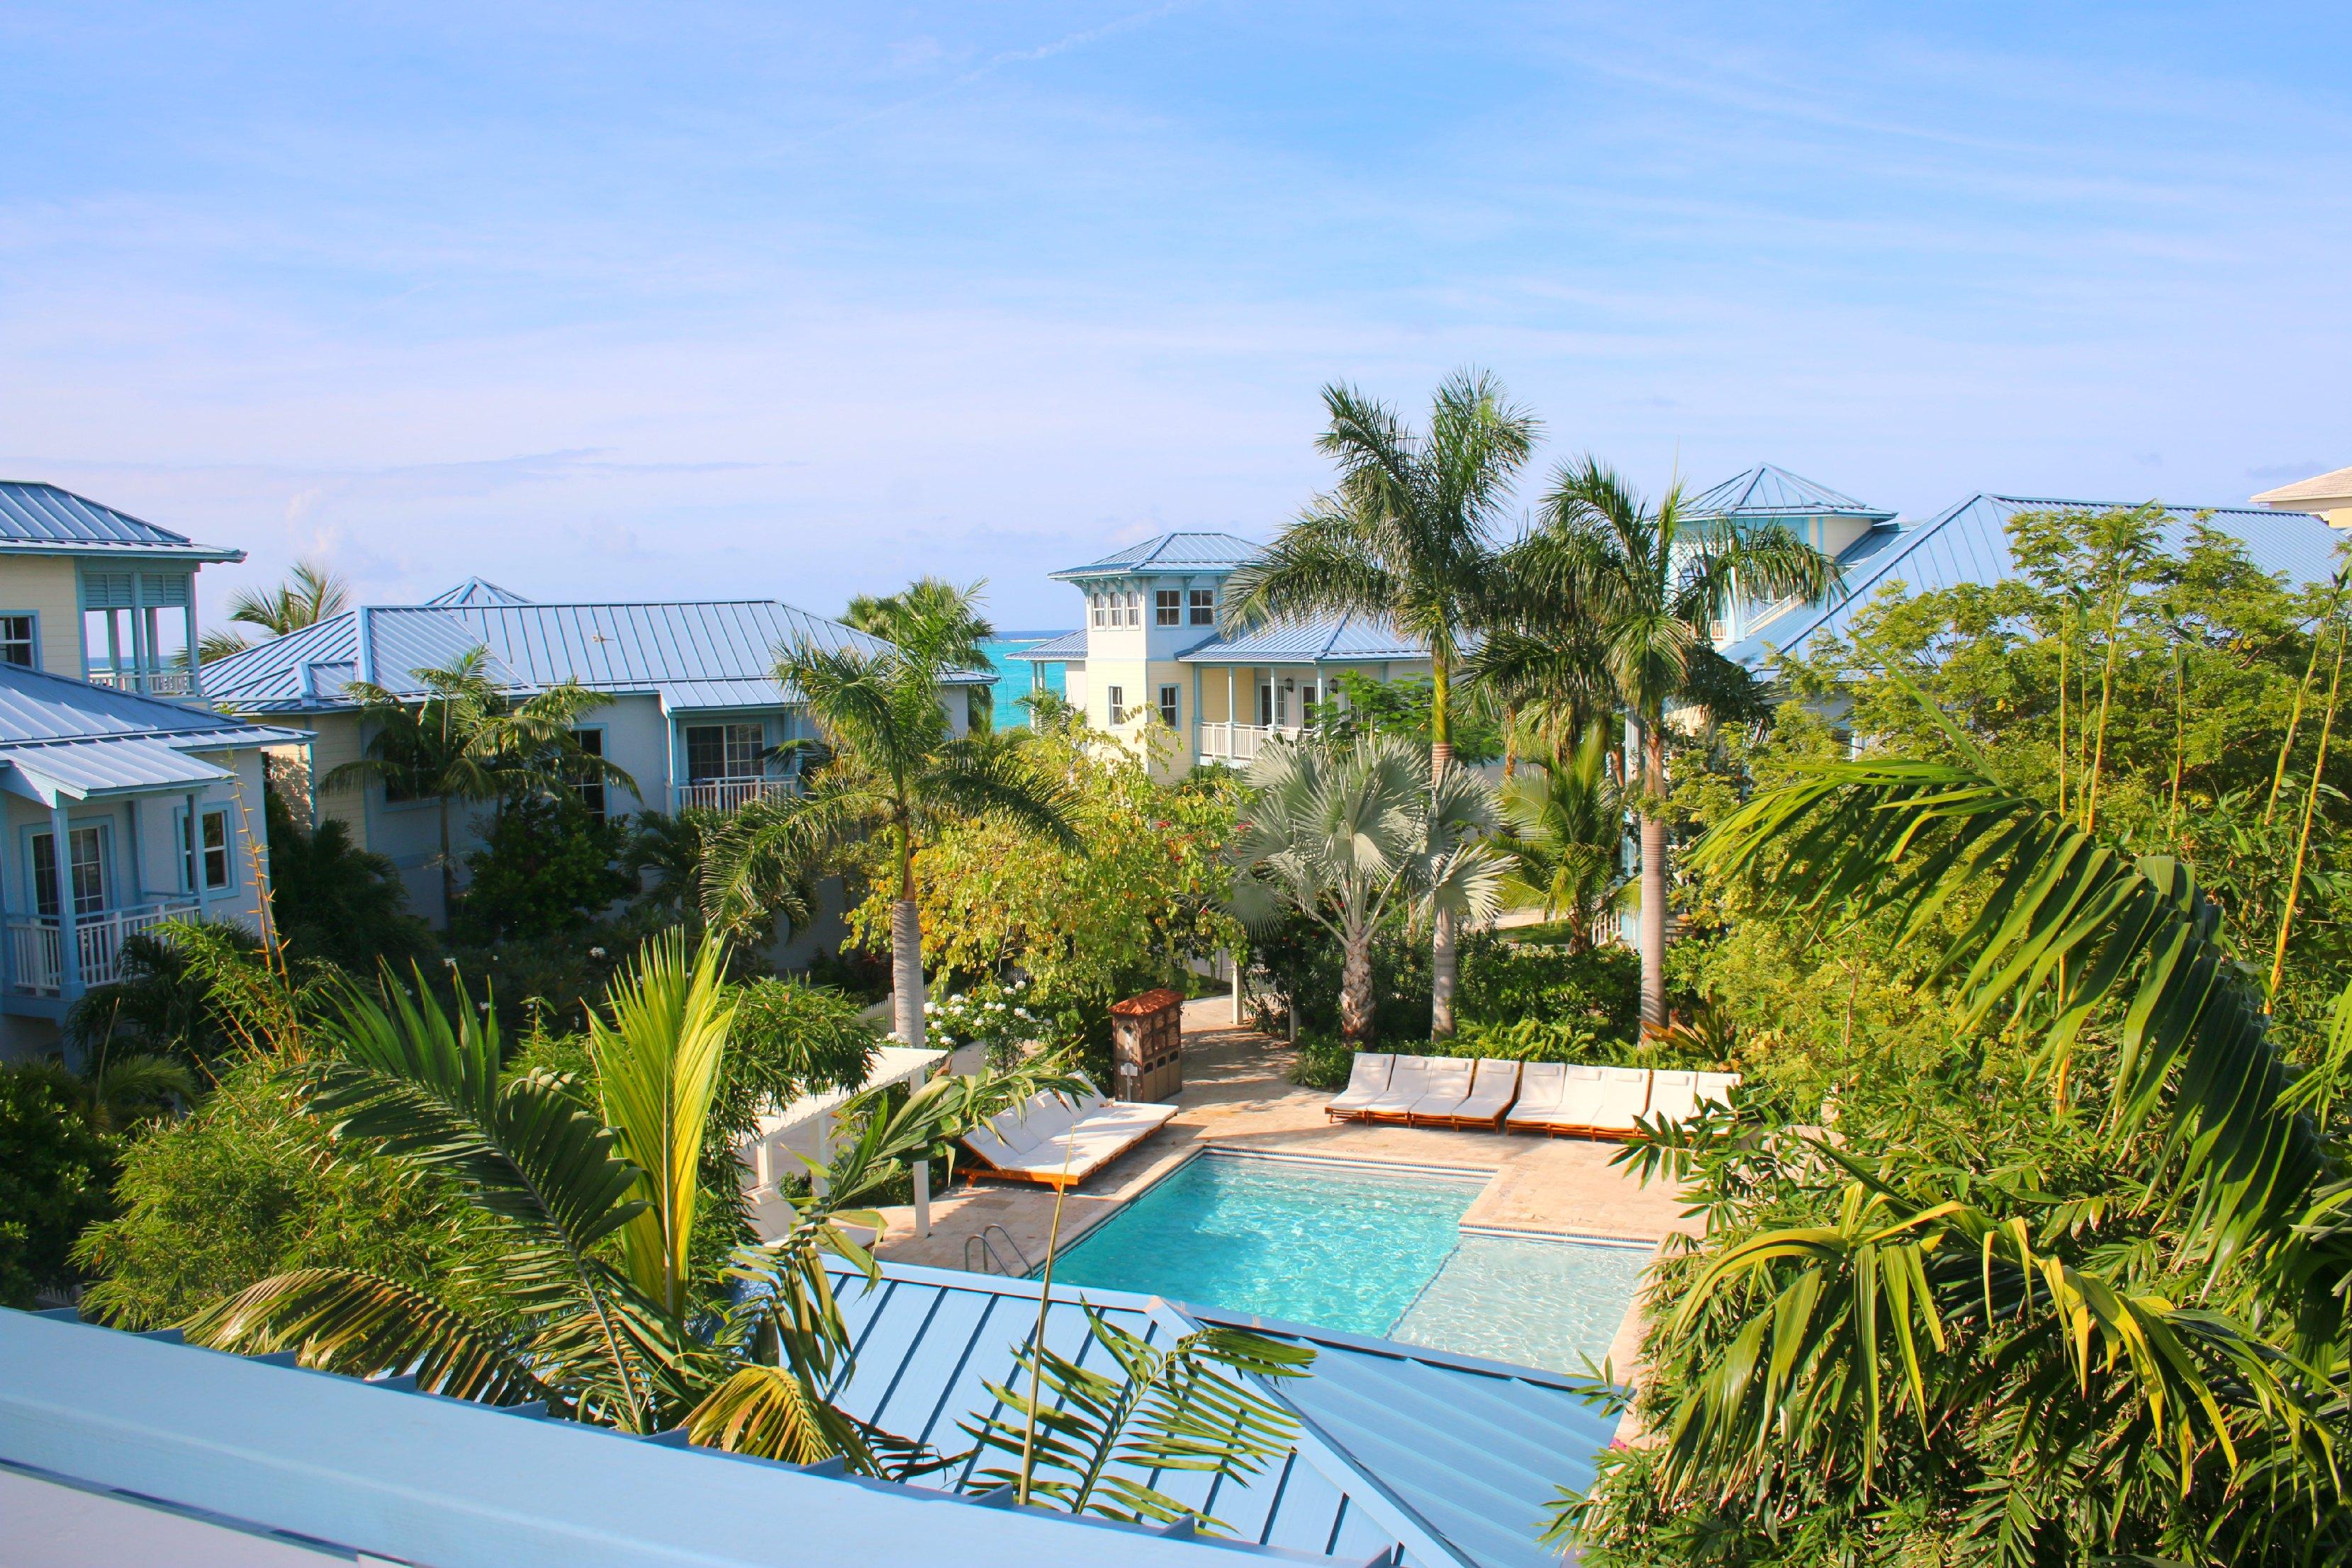 Beaches Turkes And Caicos Key West Village Photo Tour It